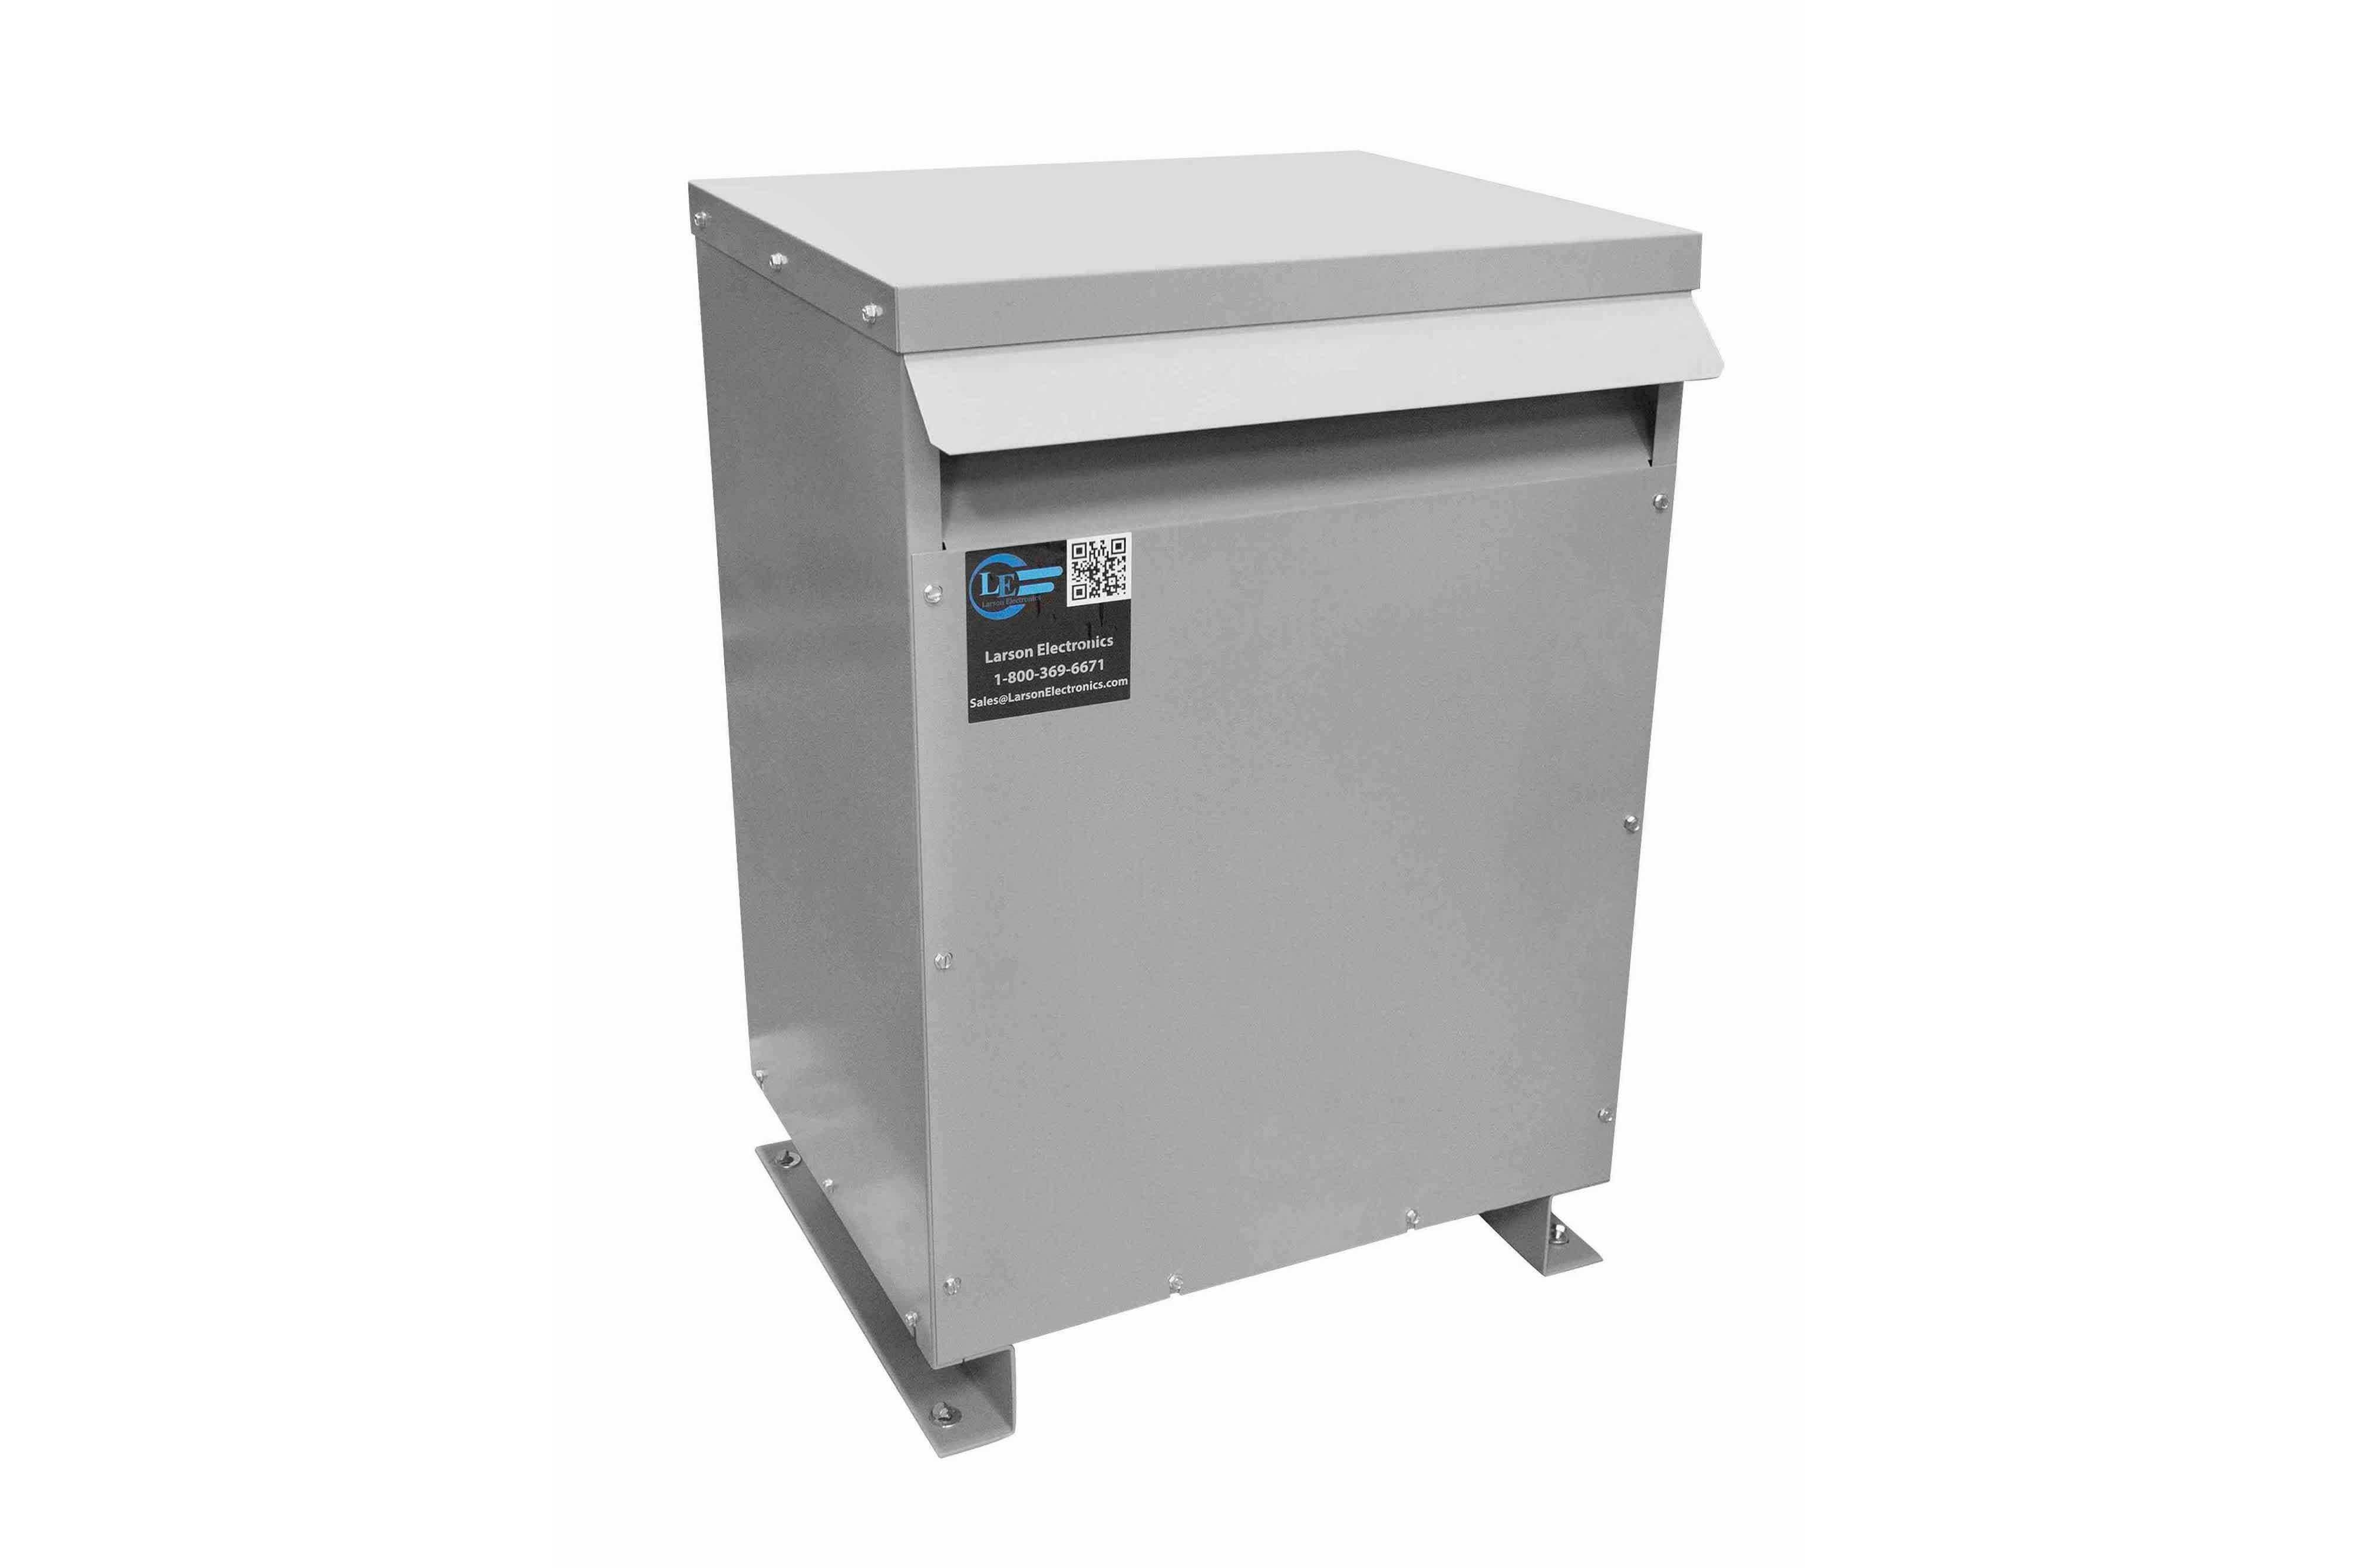 110 kVA 3PH Isolation Transformer, 415V Wye Primary, 240V Delta Secondary, N3R, Ventilated, 60 Hz